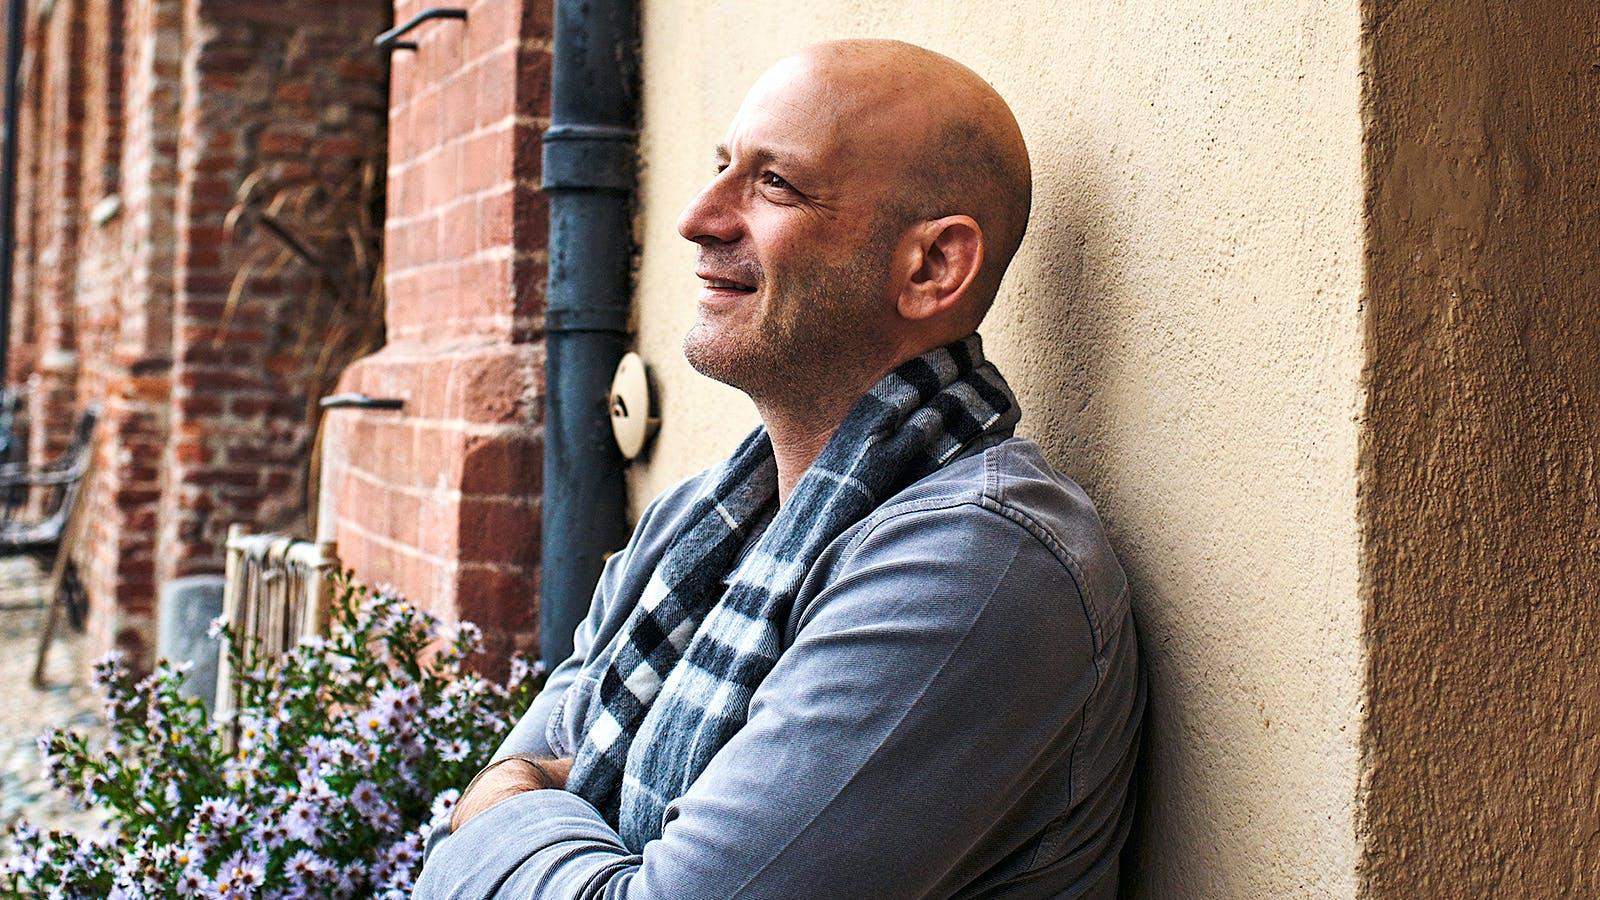 Chef-Restaurateur Marc Vetri Opens Italian Pop-Up in Las Vegas